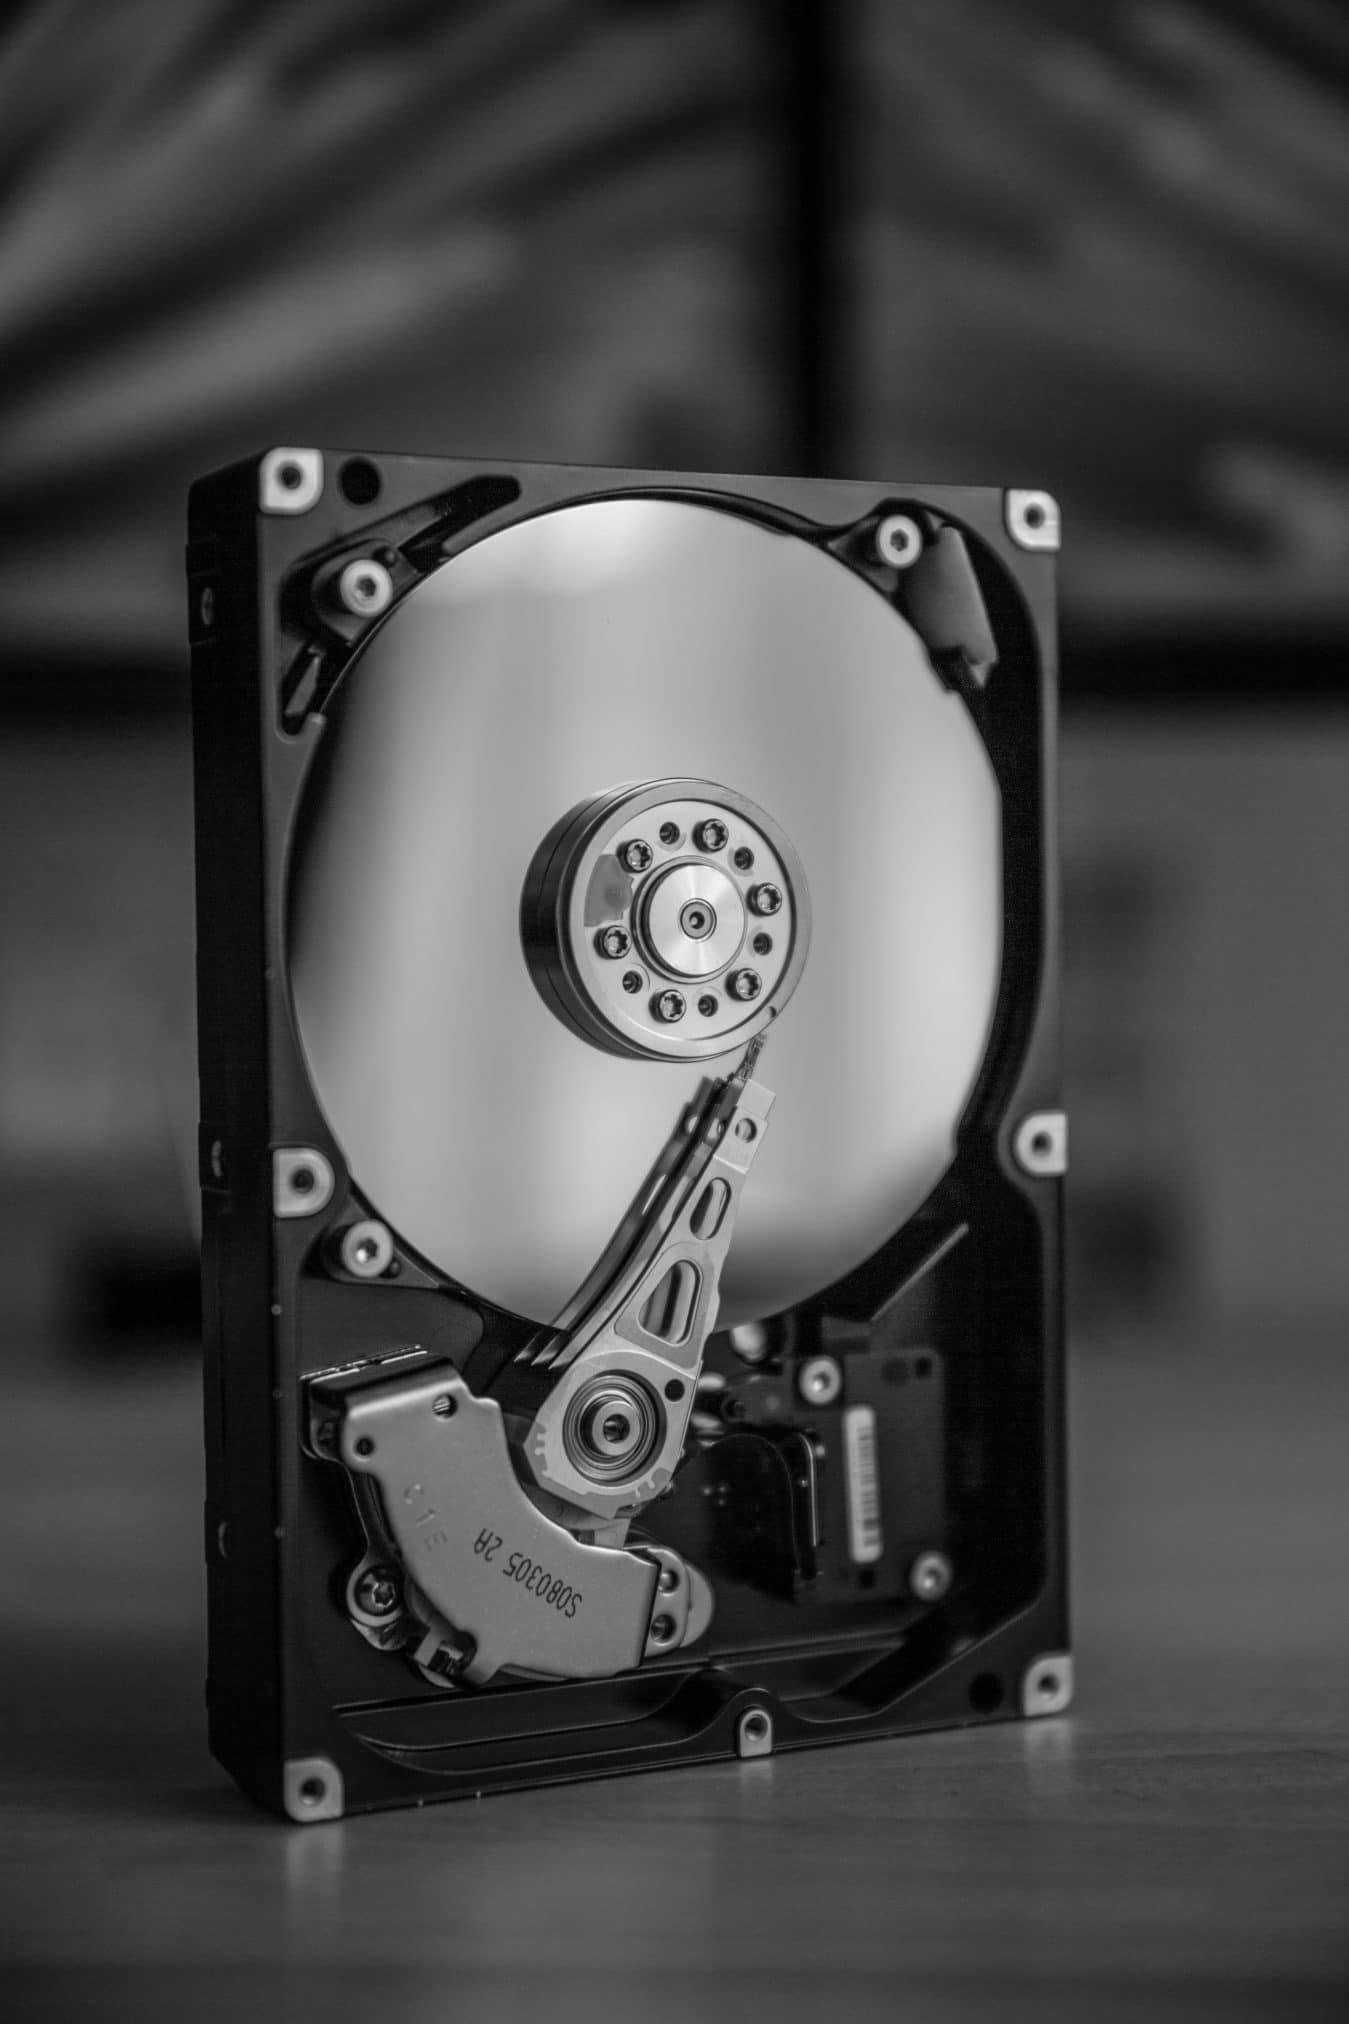 Device Maintenance & Upgrades 3  - Kernel IT Services